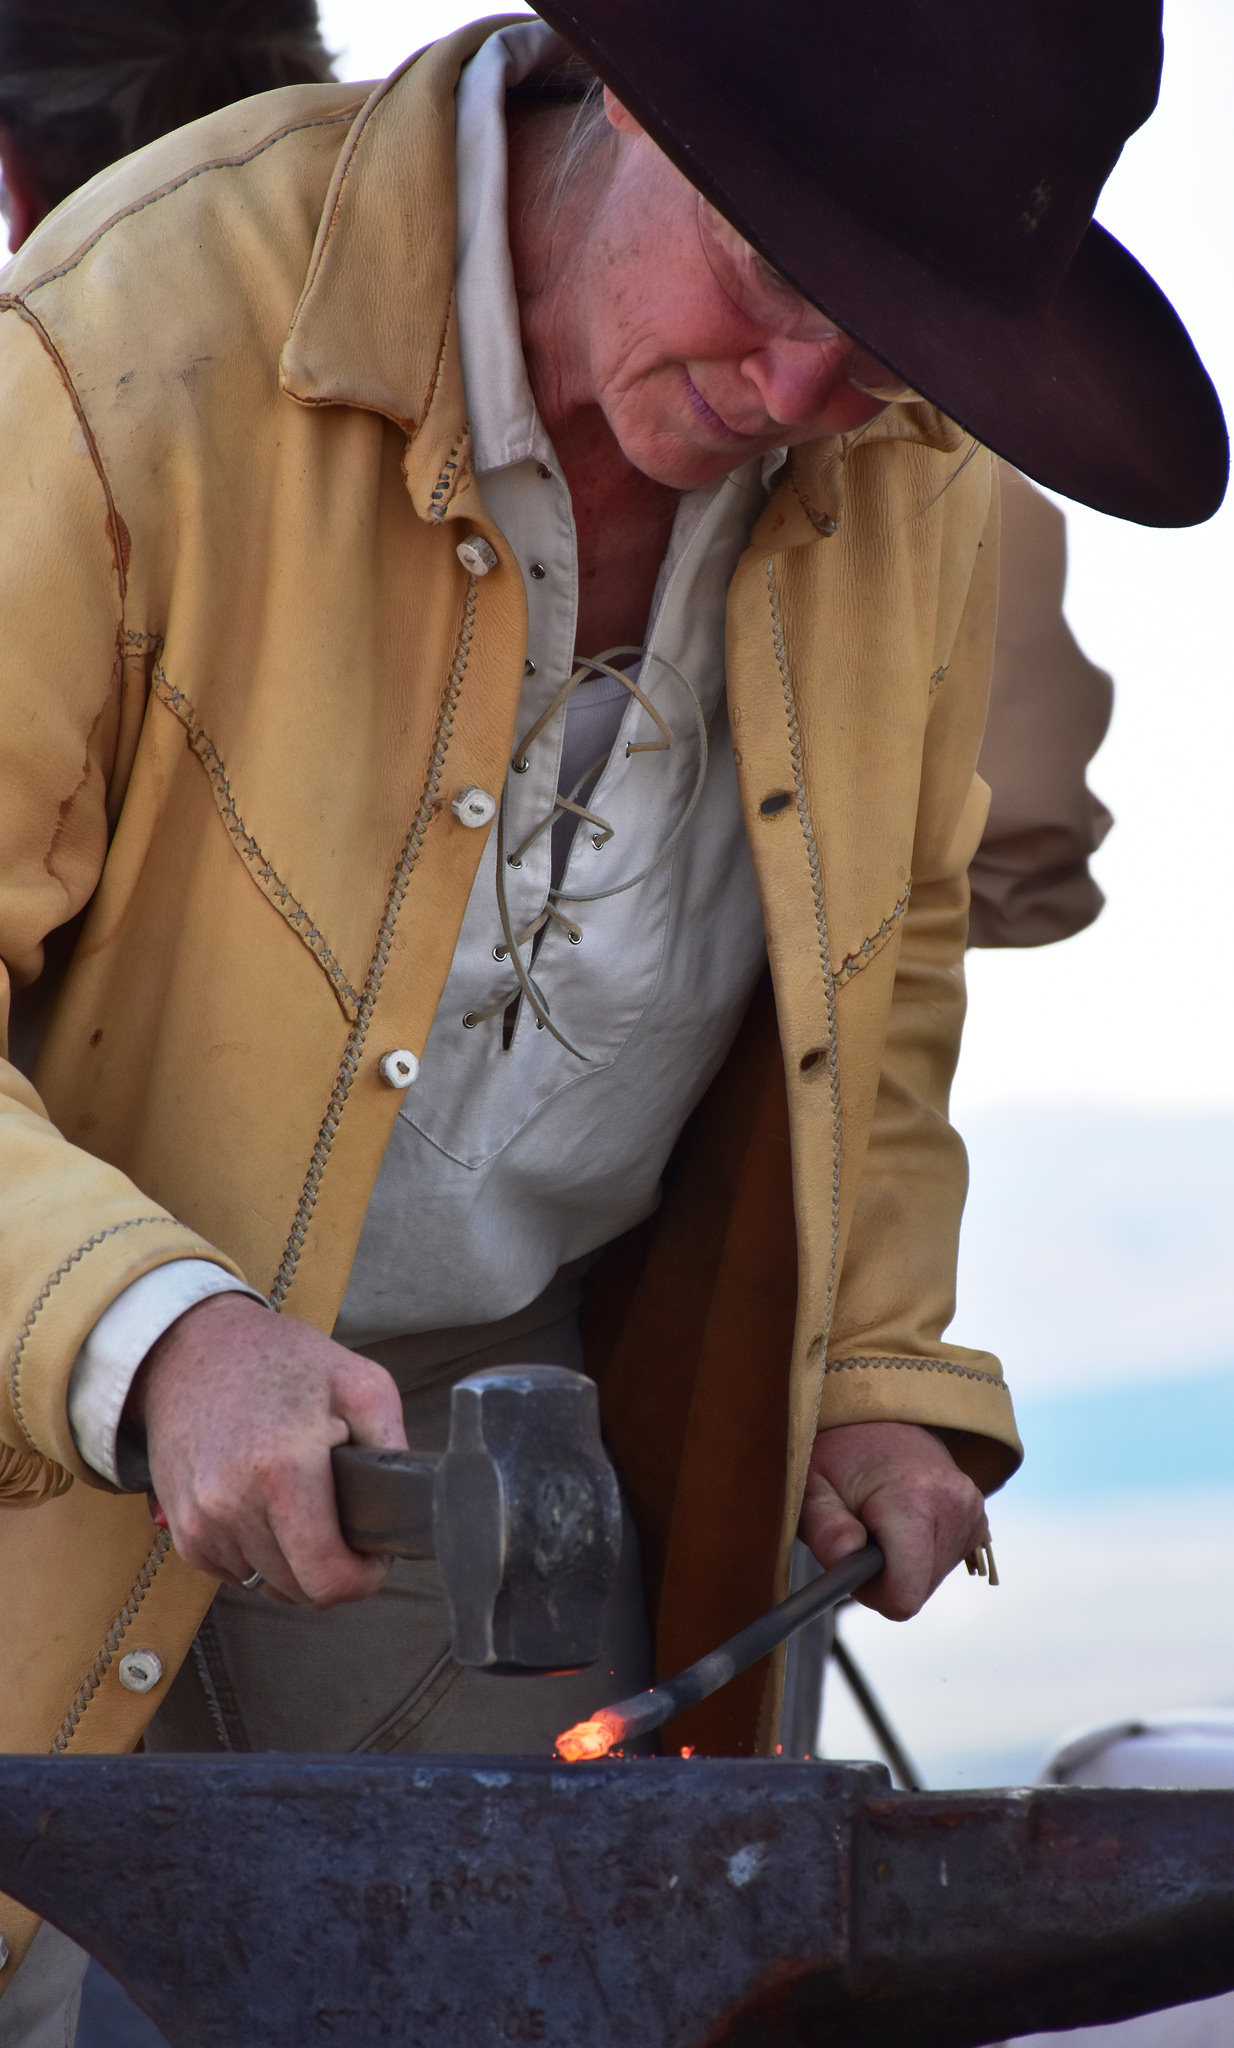 Blacksmith at National Oregon Trail Interpretive Center